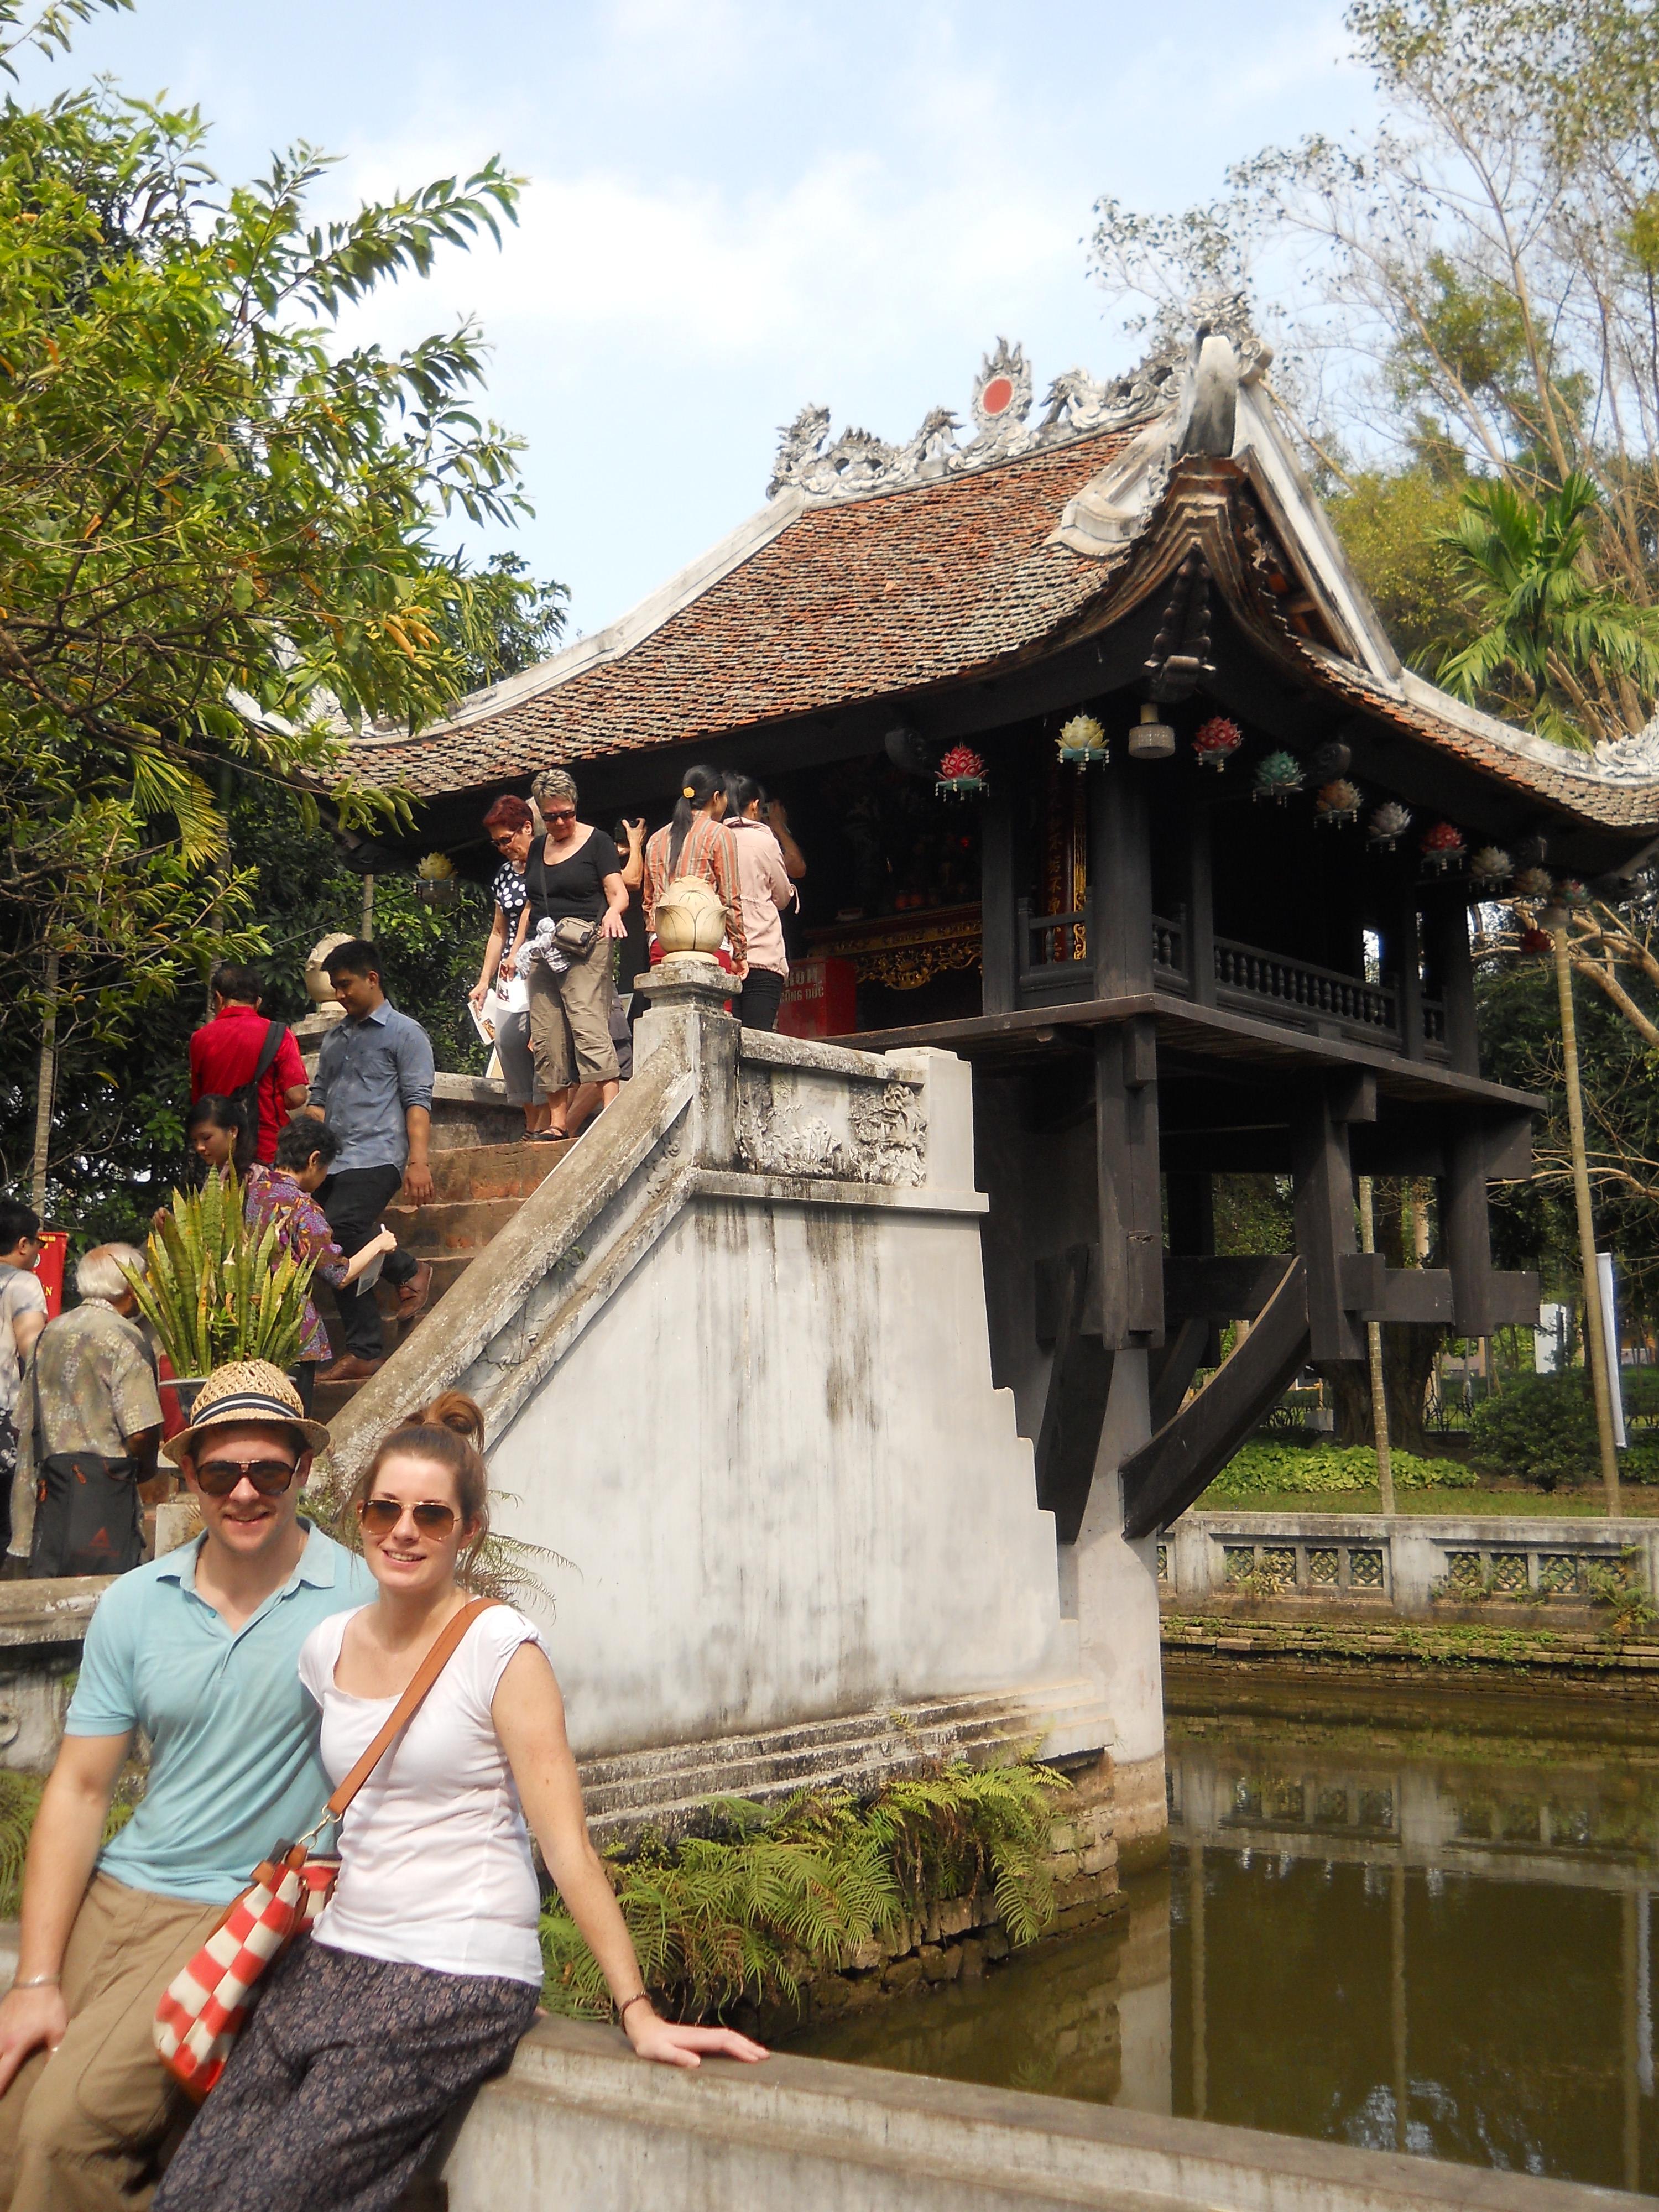 The Lotus Pagoda, Hanoi